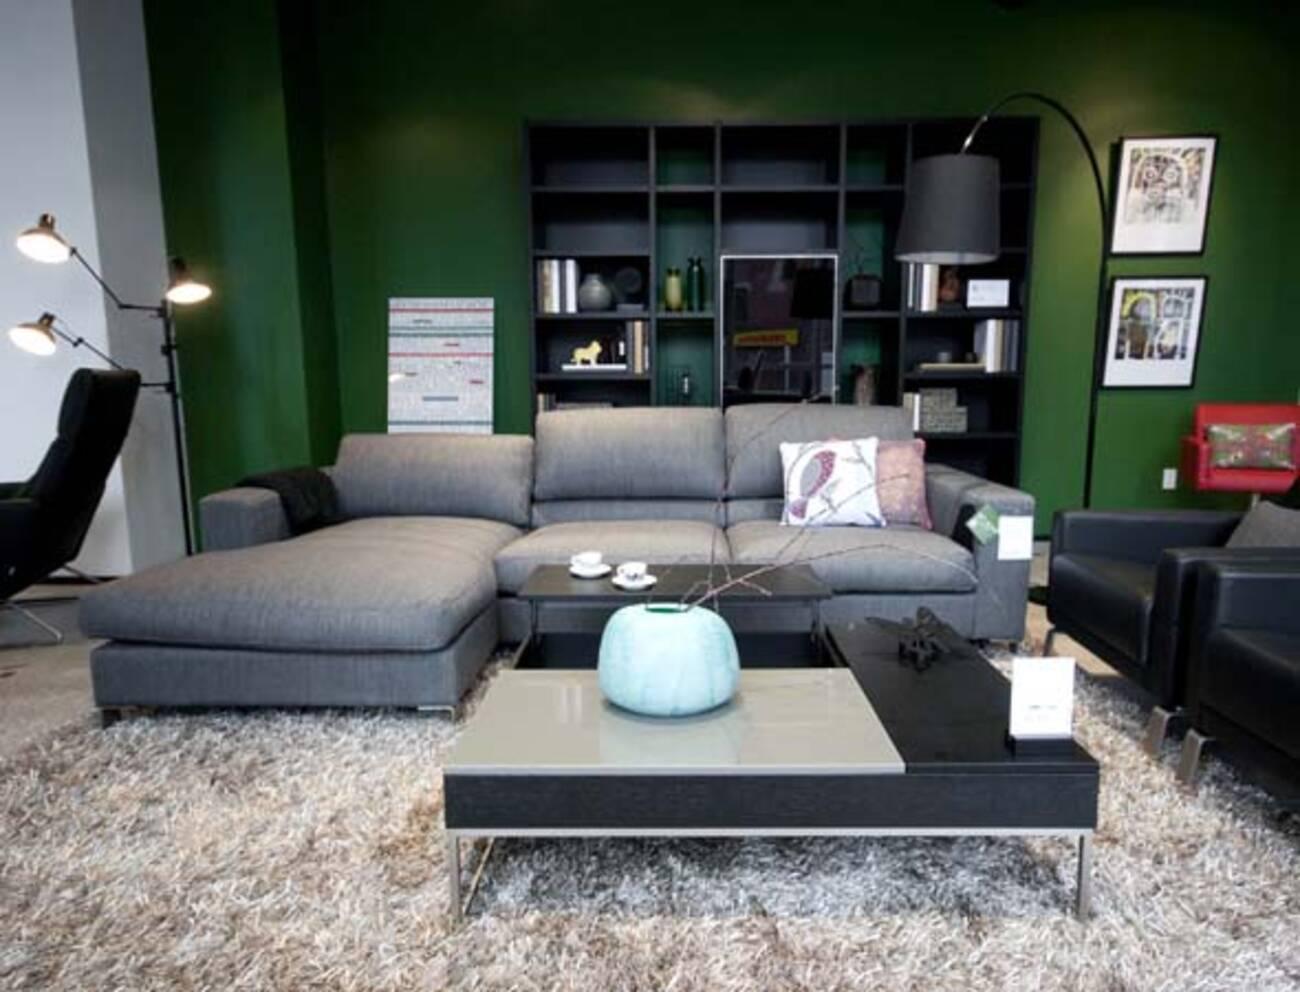 Denmark based furniture chain opens on adelaide for Oriental furniture adelaide